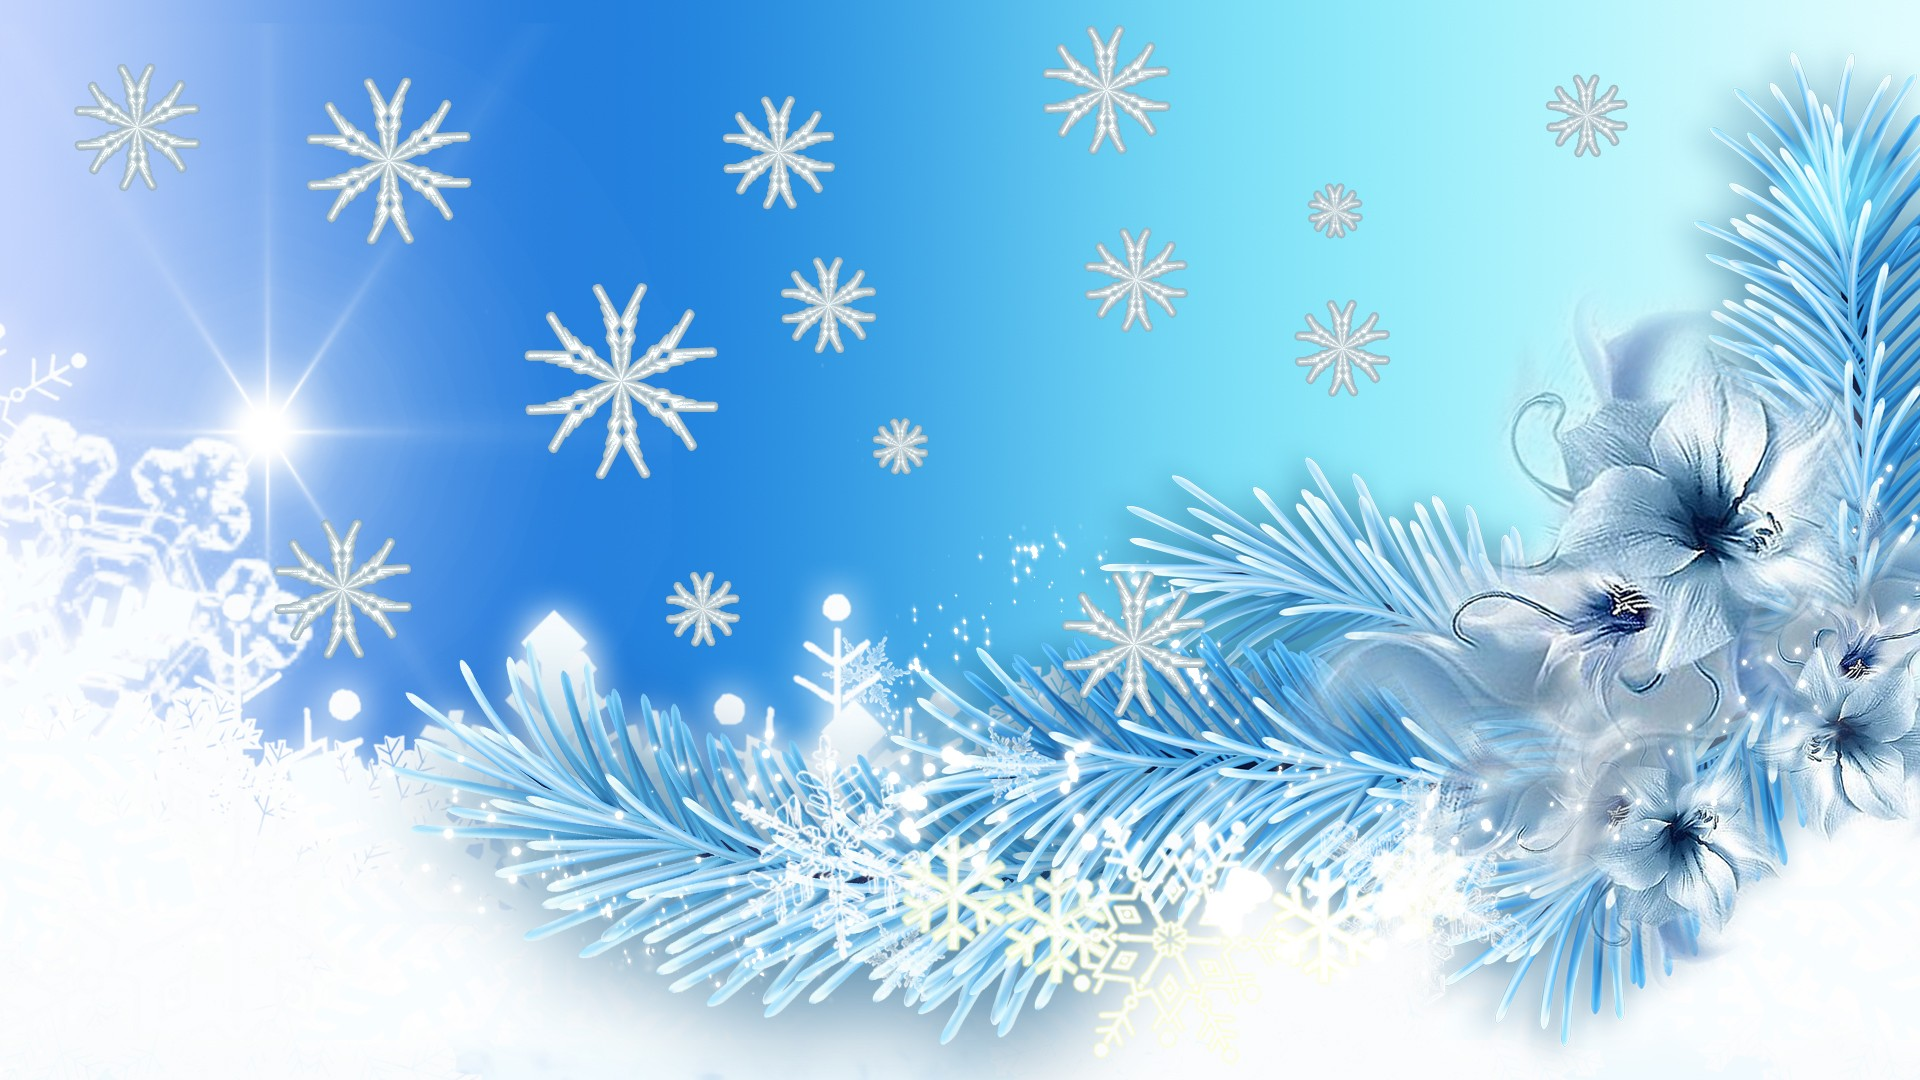 artistic winter artistic branch snowflake flower snow blue white wallpaper